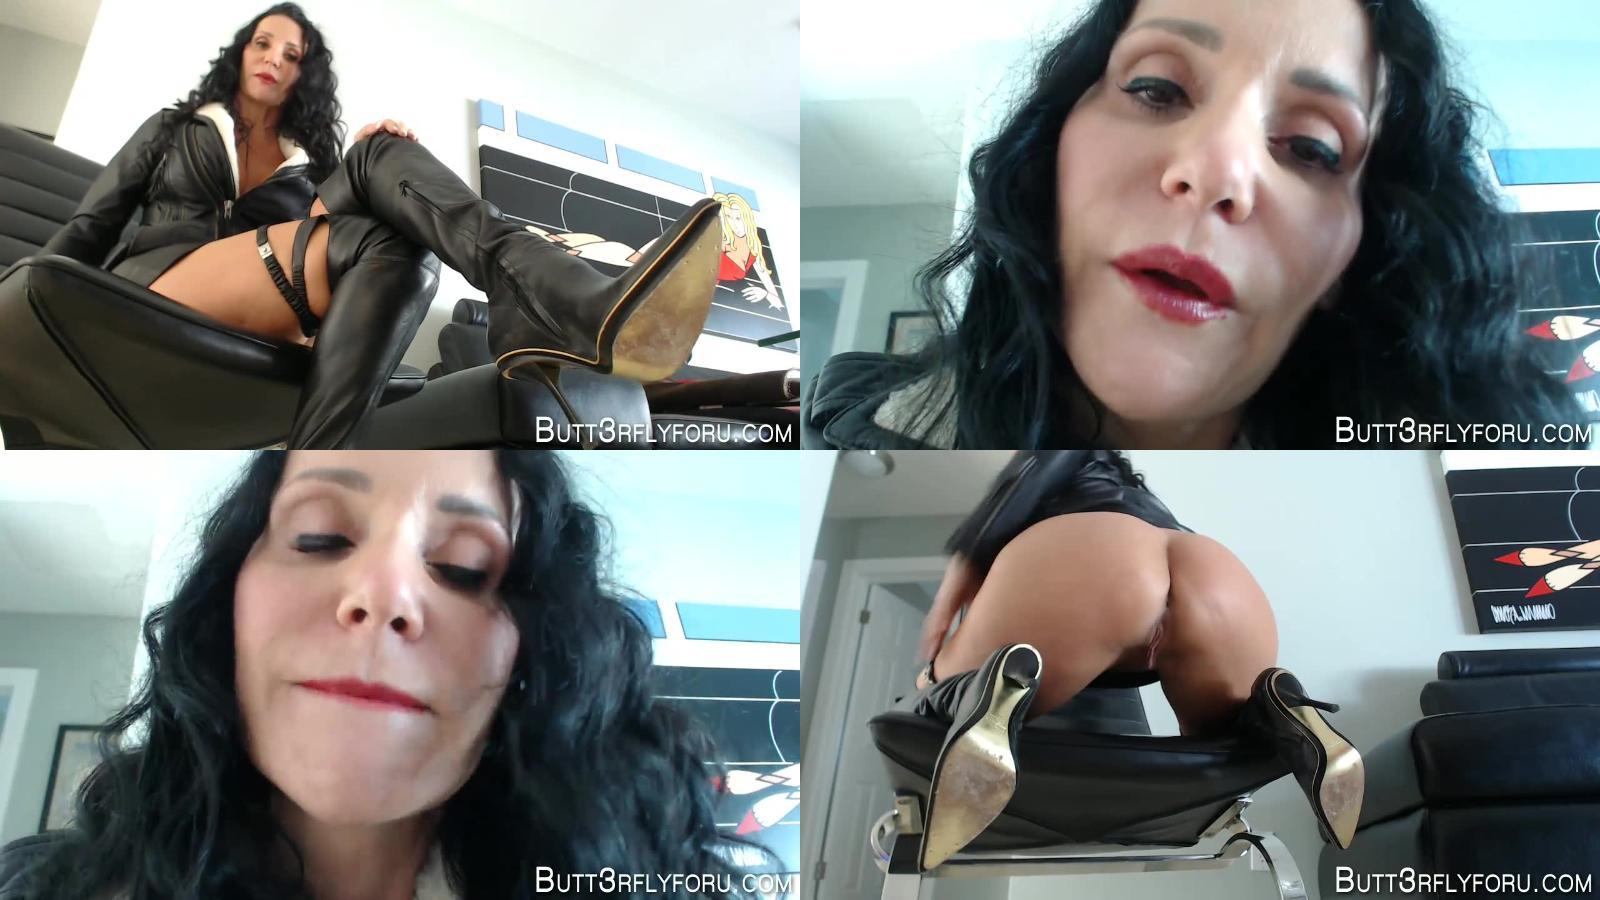 Butt3rflyforU – Strict Cum Control Milf Wearing All Leather